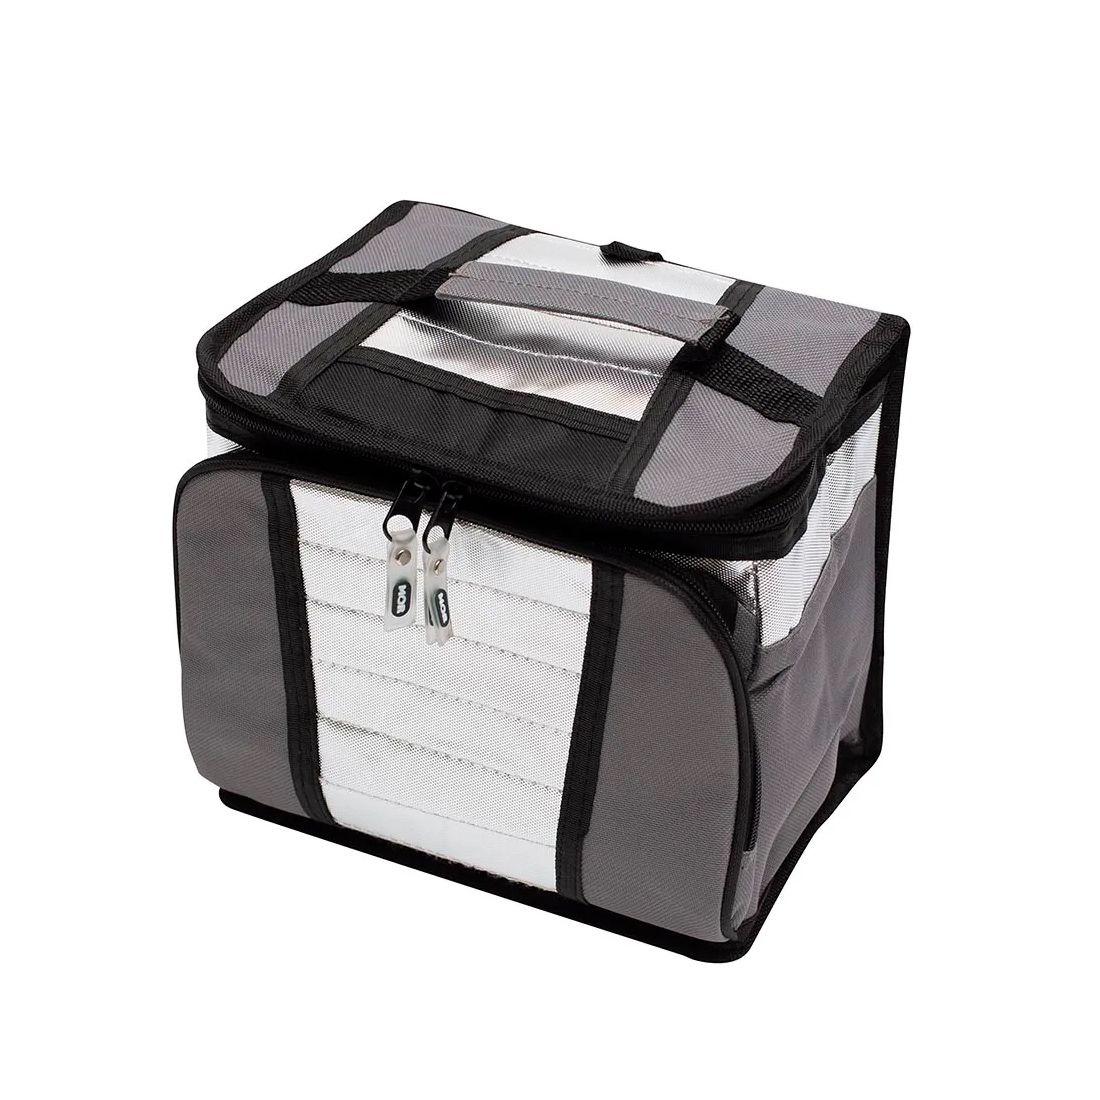 Bolsa Térmica Ice Cooler Mor Cinza - 7,5 Litros